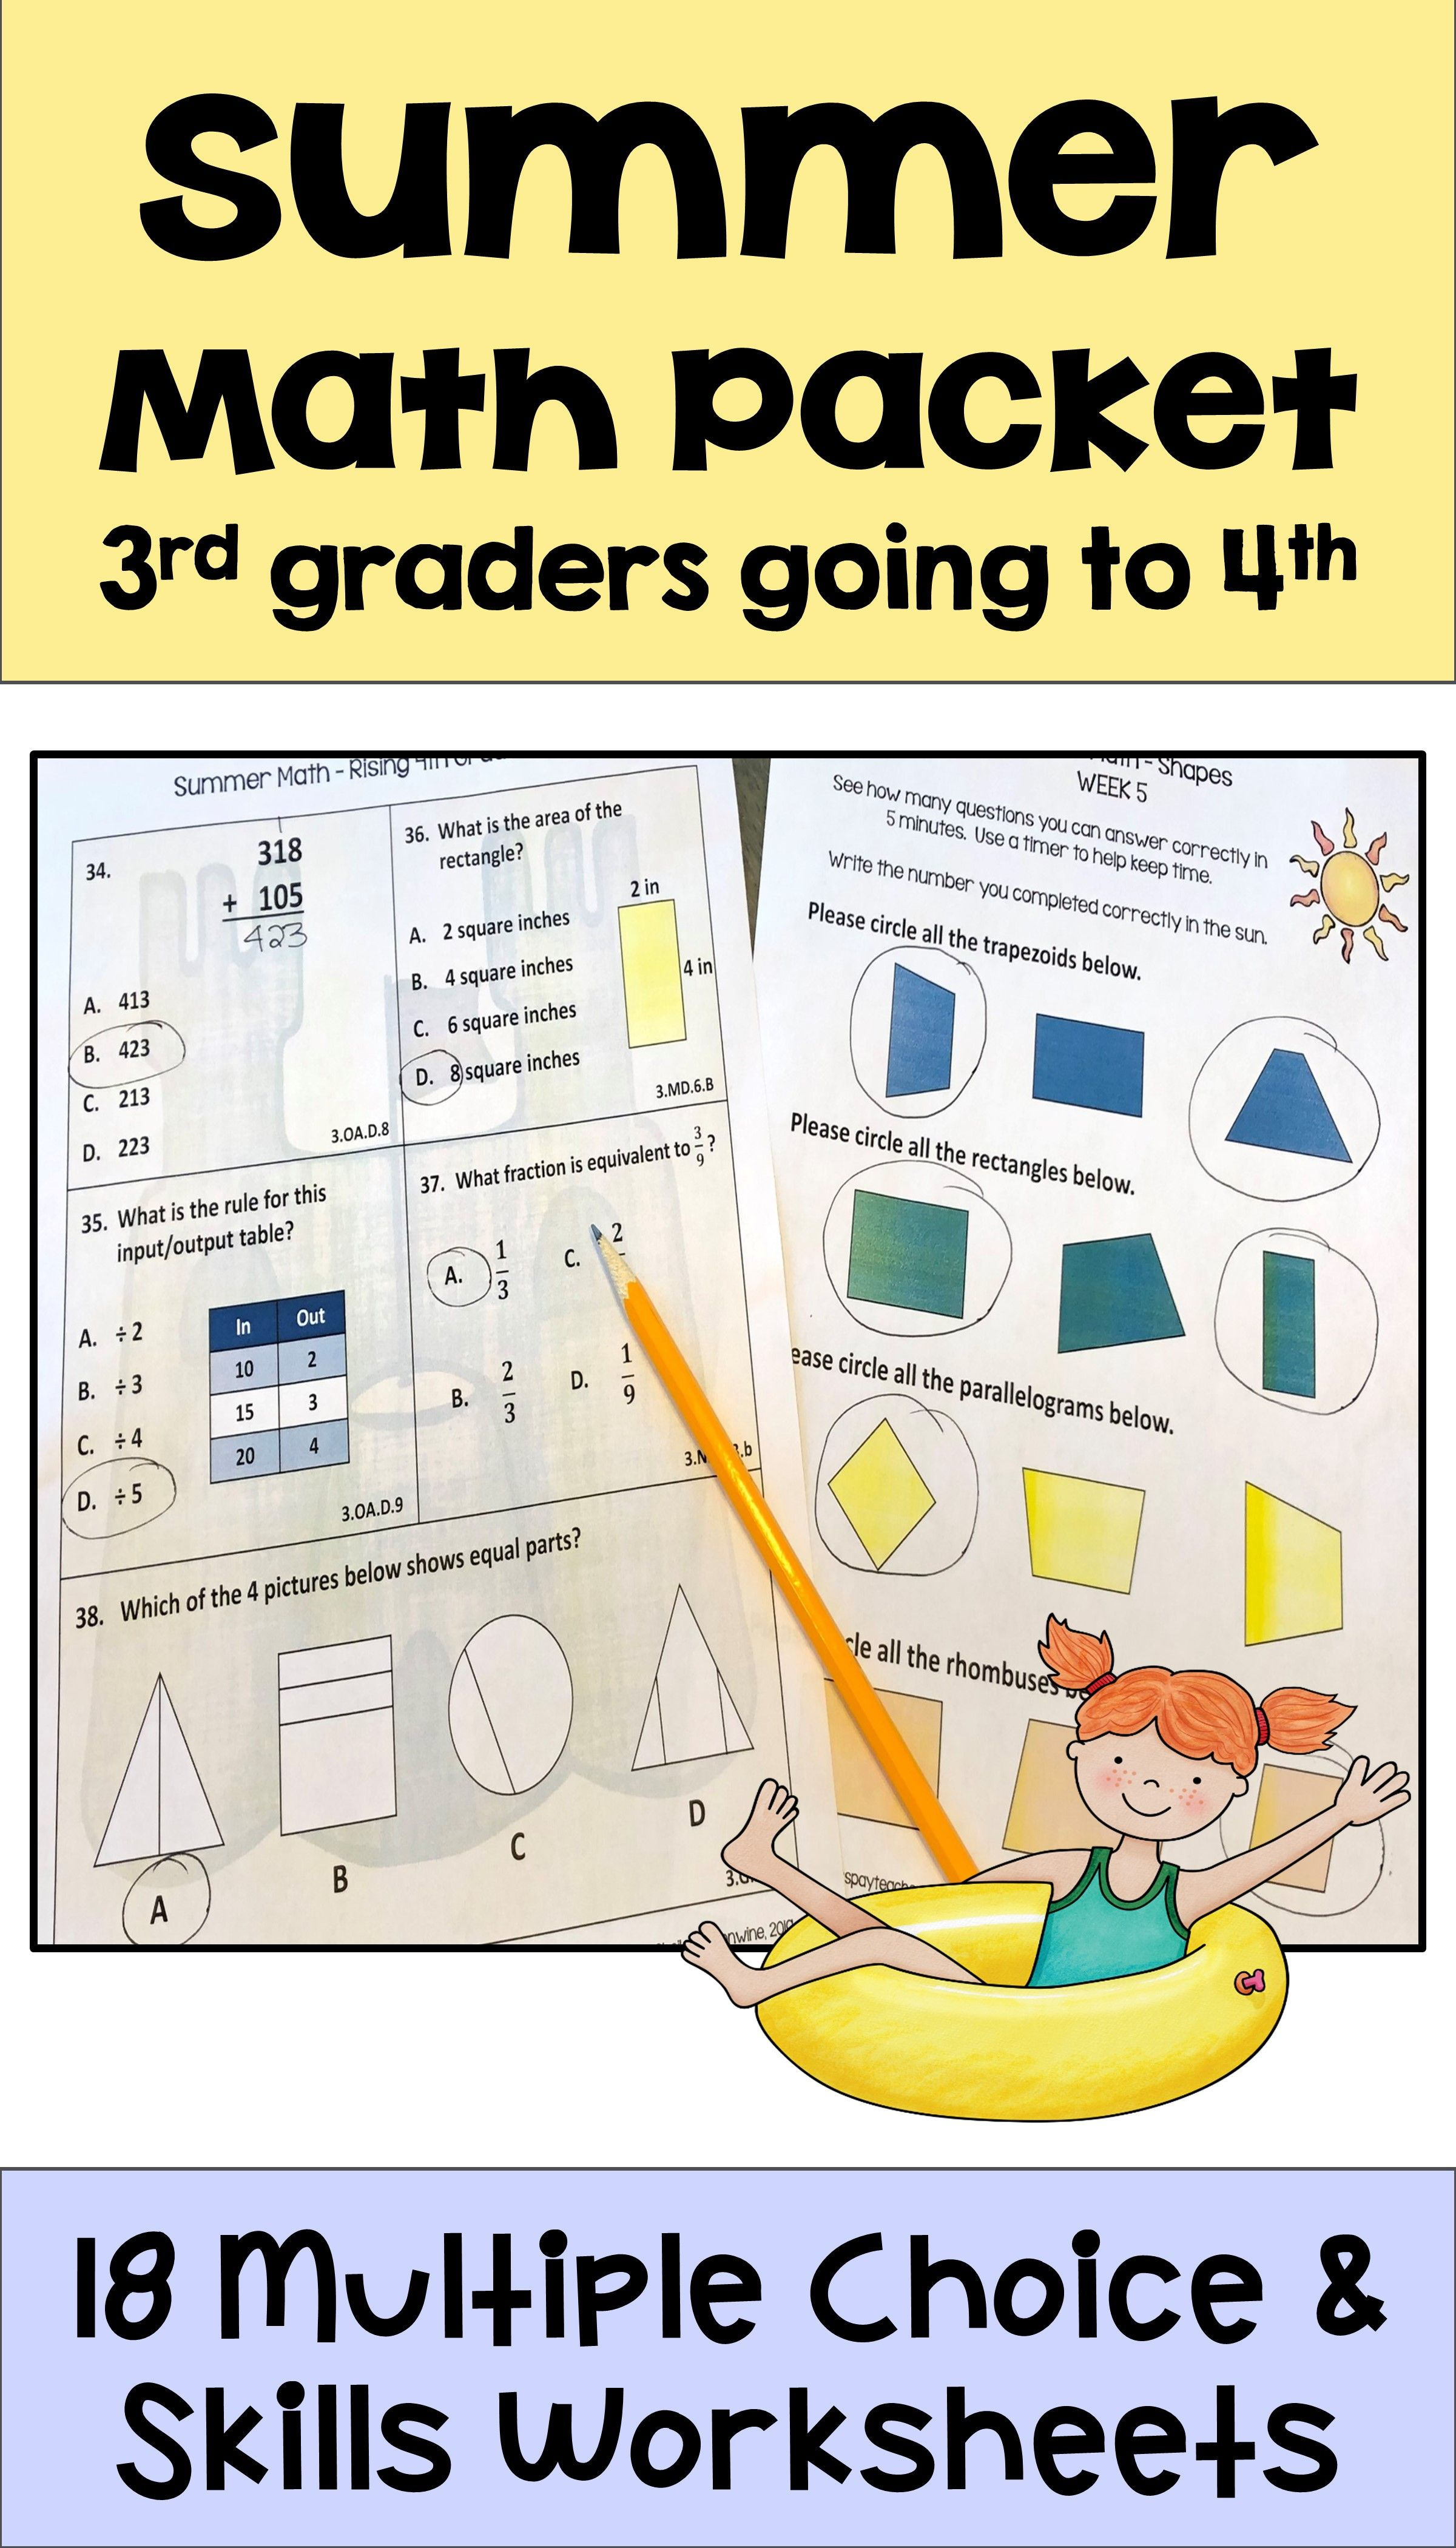 medium resolution of Summer Math Packet for Rising 4th Graders - Review of 3rd Grade Math   Math  packets